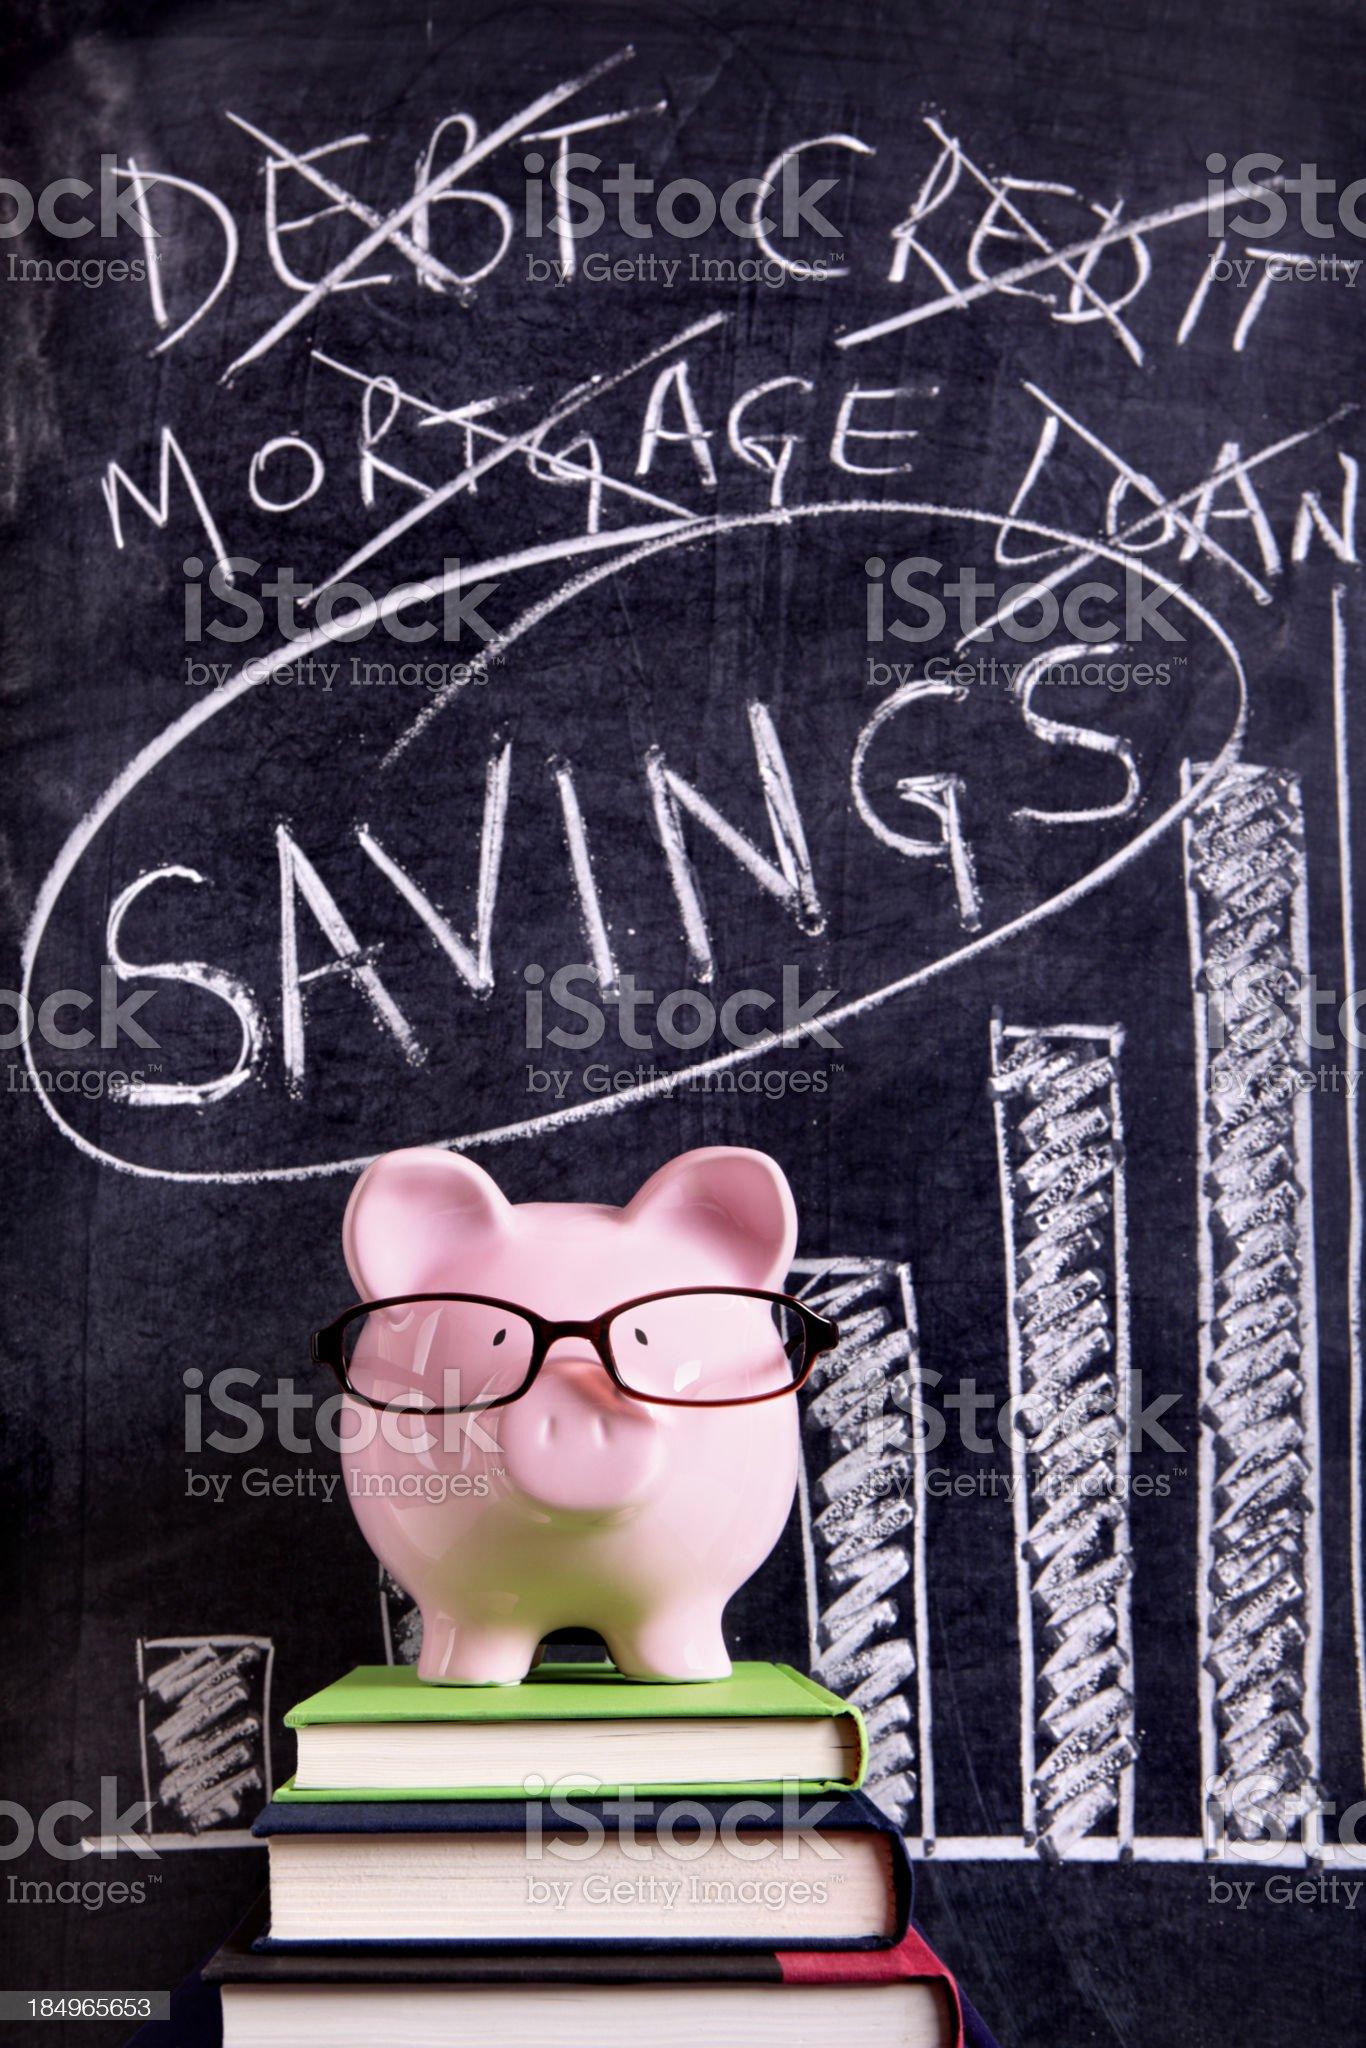 Piggy Bank with savings advice royalty-free stock photo